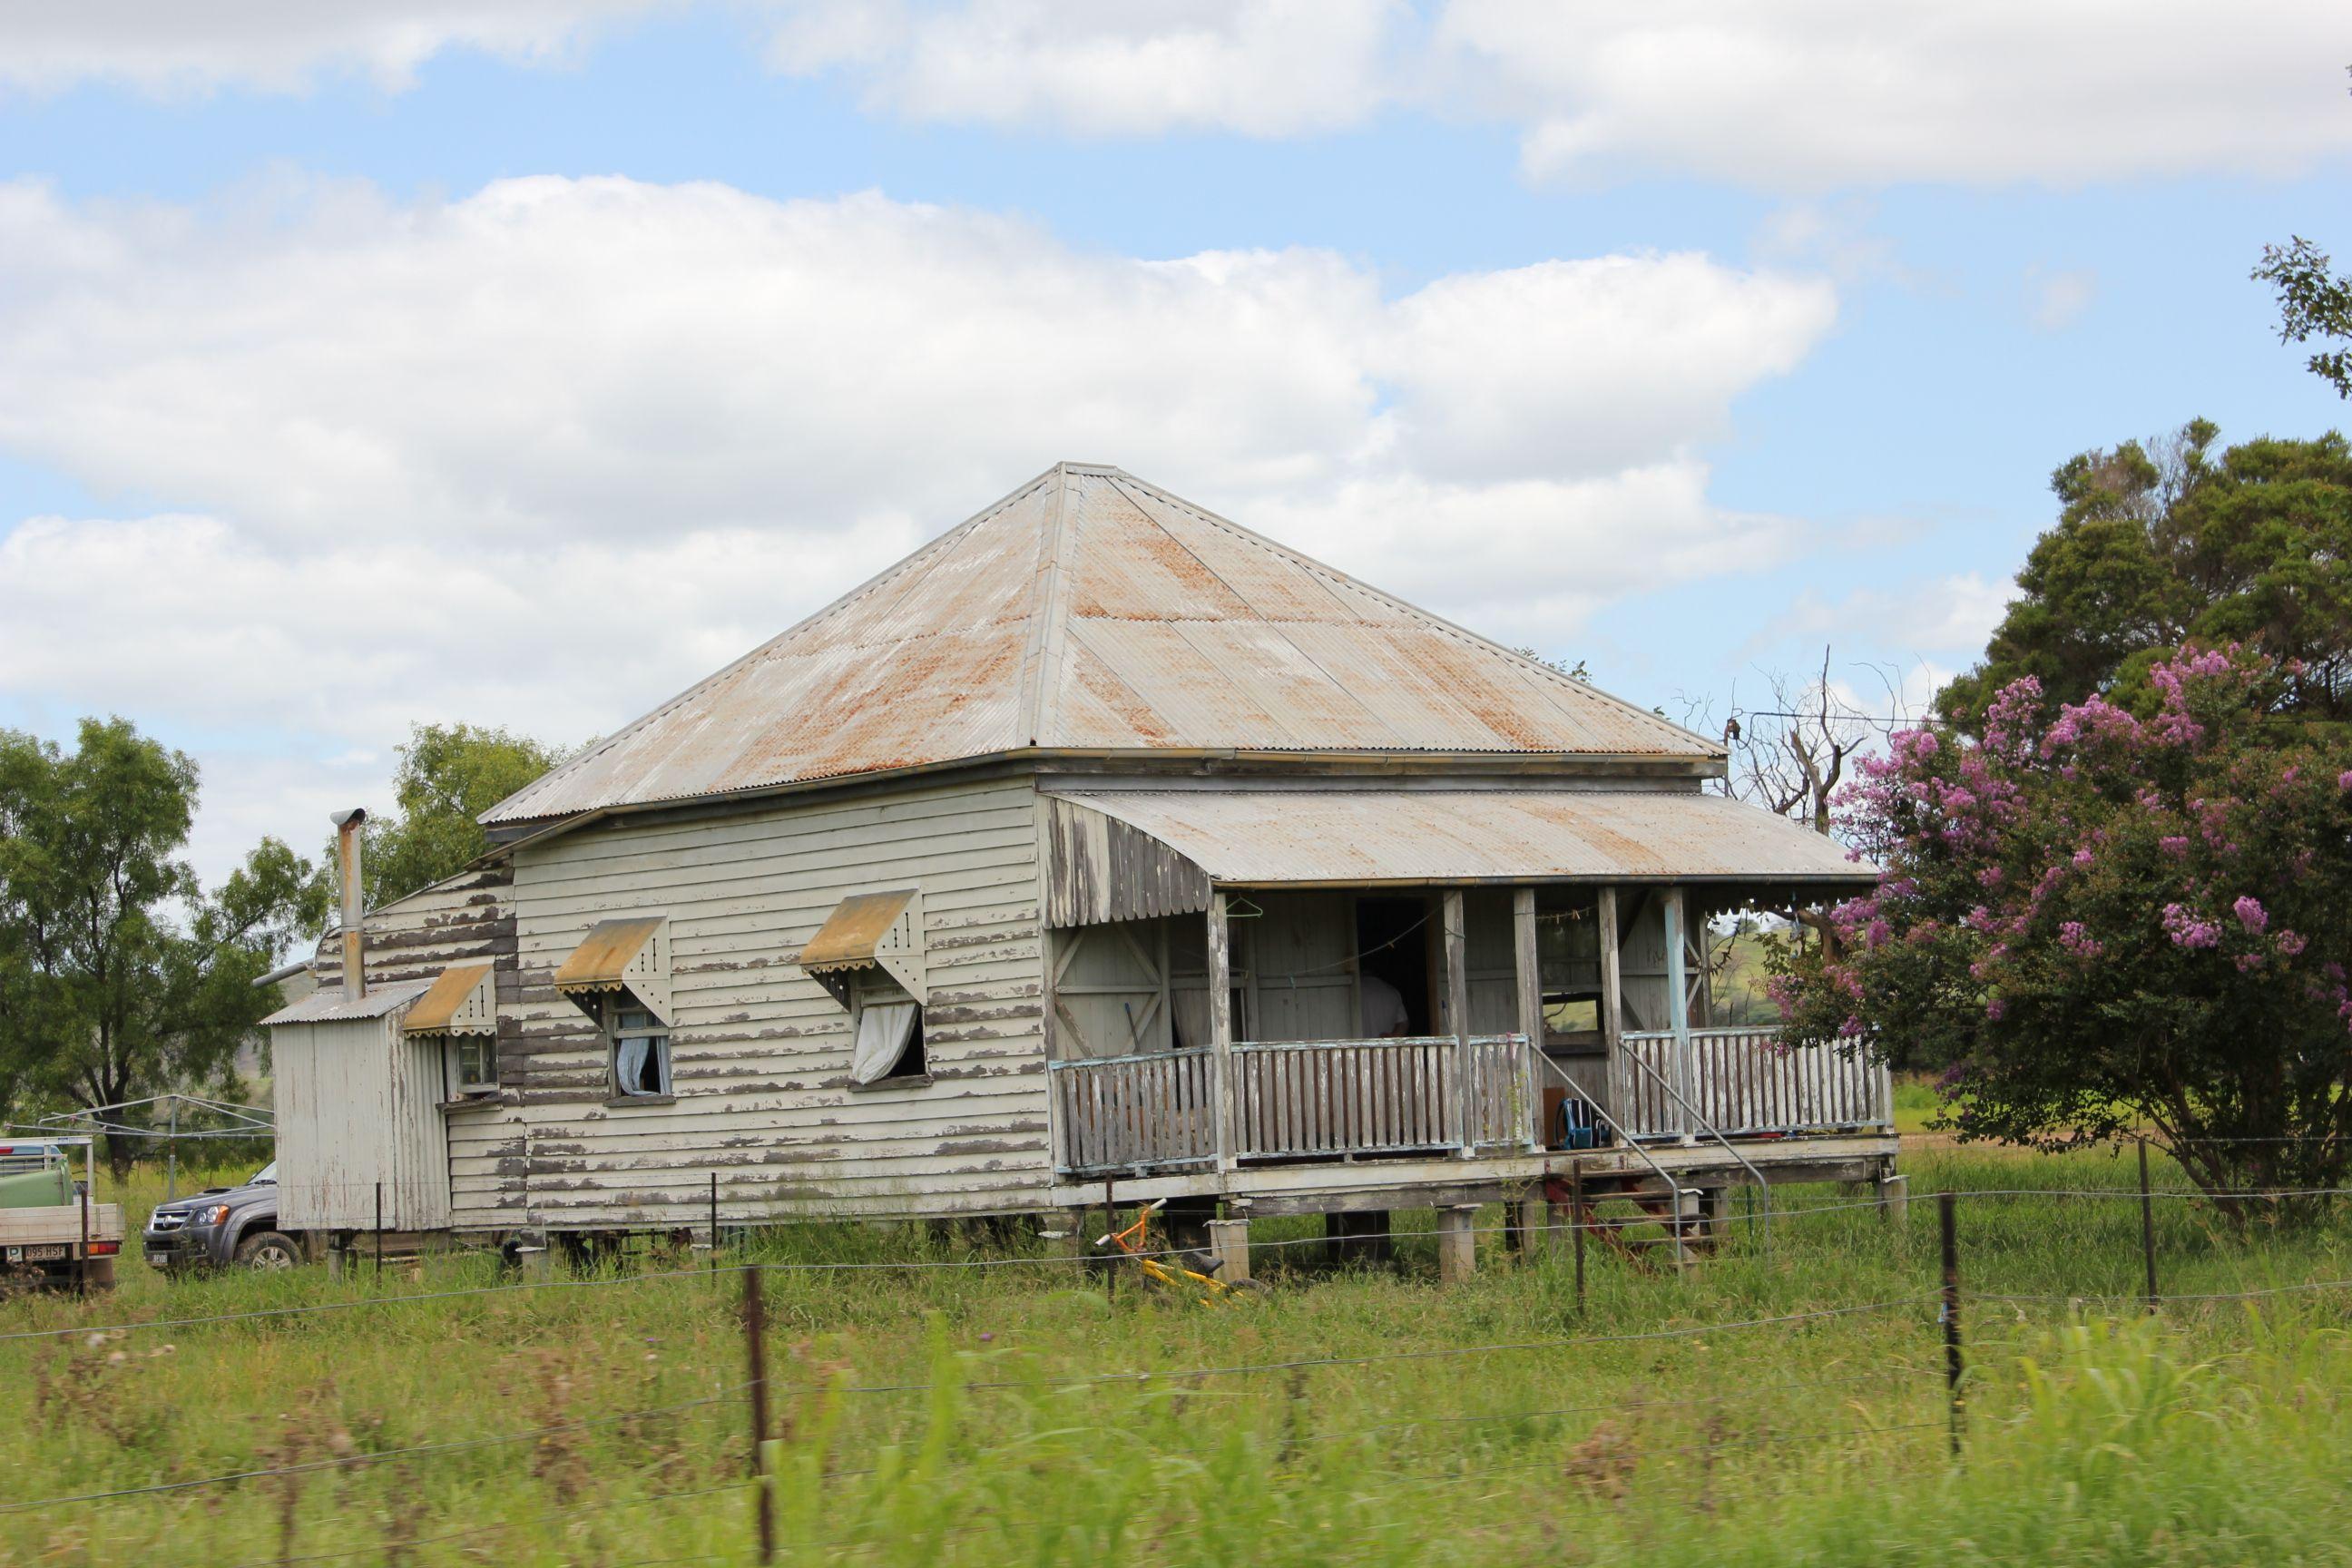 c6179a26f7ab68188cad043f37e31907 - View Photos Of Australian Farm Houses  Gif